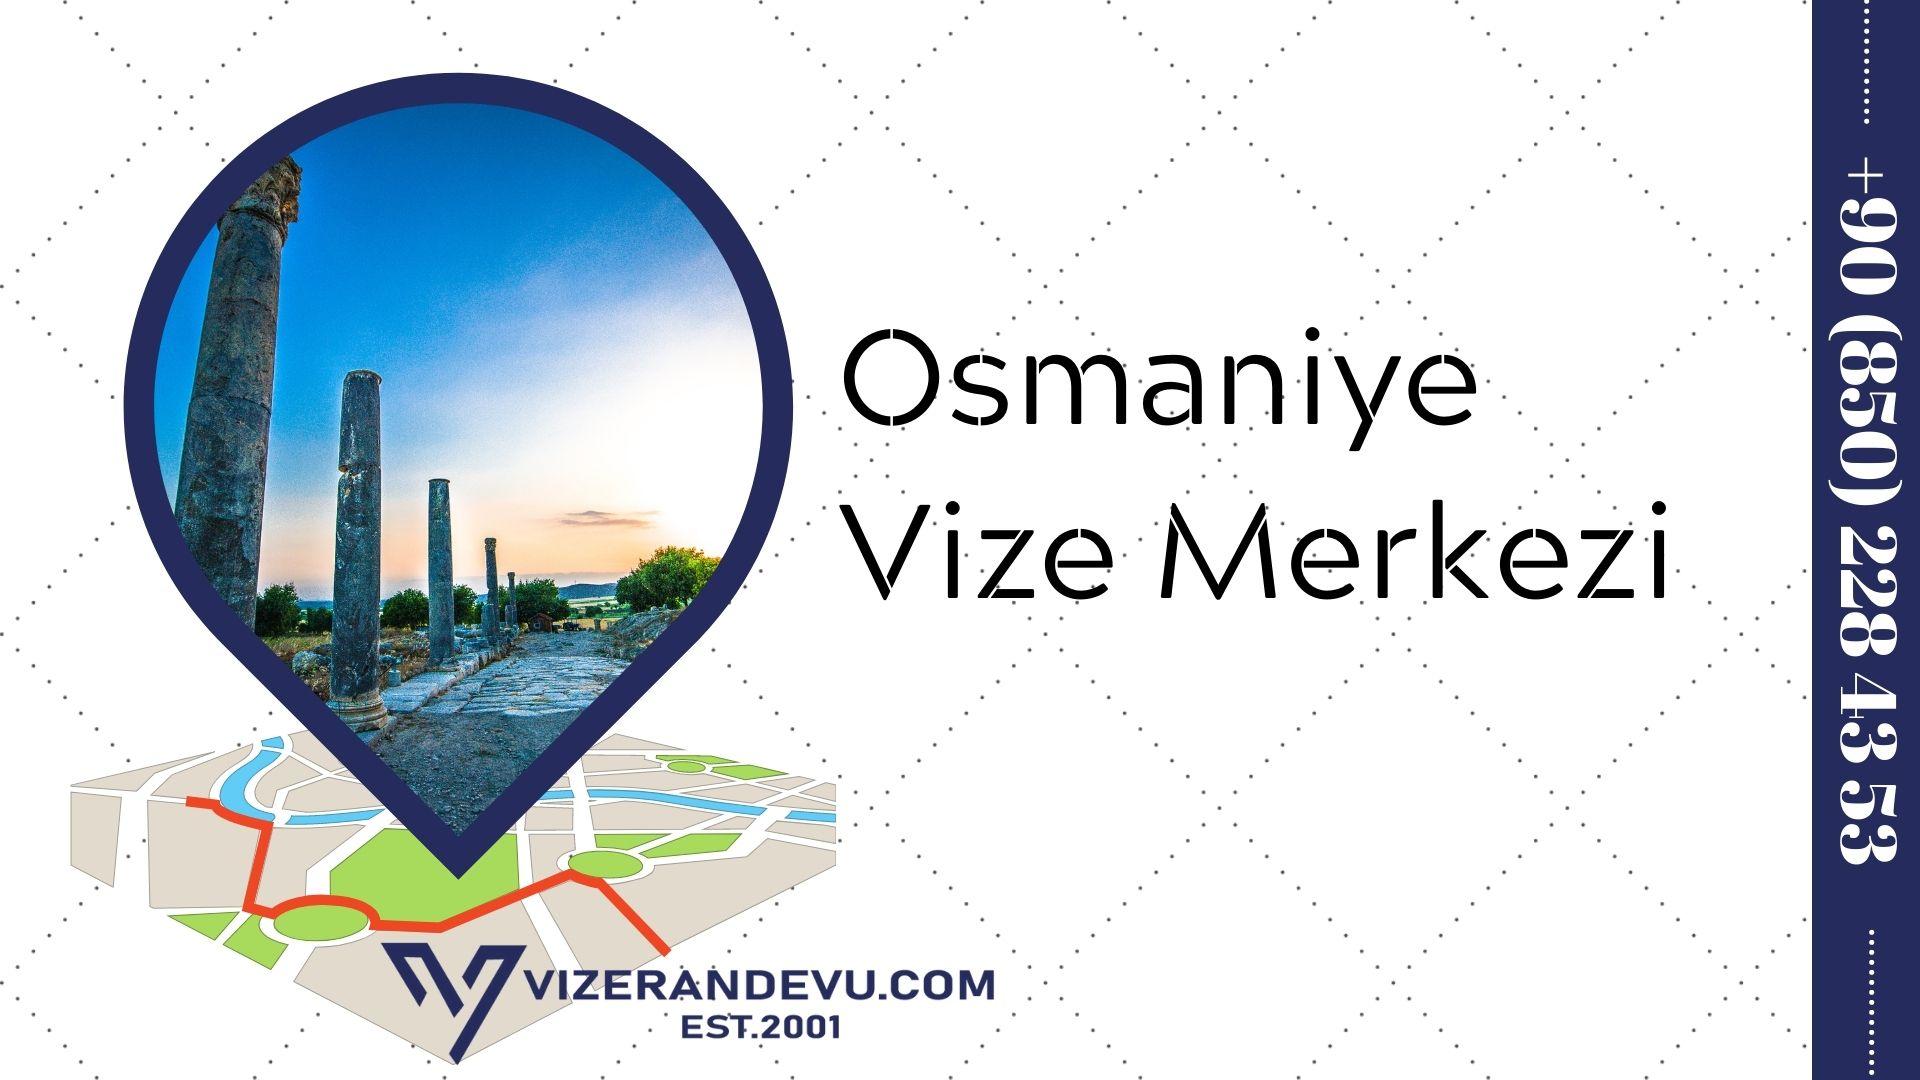 Osmaniye Vize Merkezi